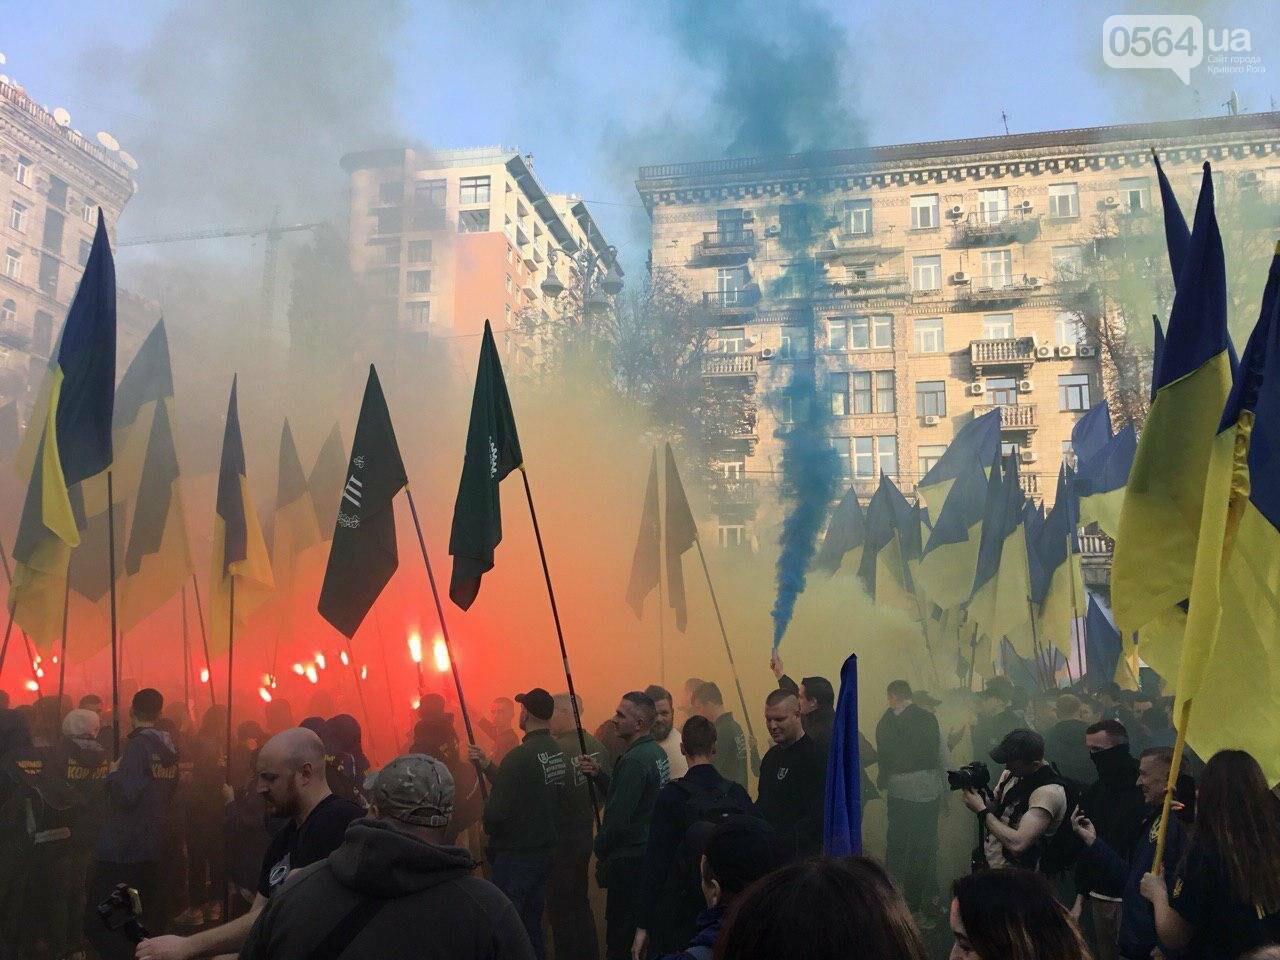 Криворожане поддержали Марш сопротивления капитуляции в Киеве, - ФОТО, ВИДЕО, ОБНОВЛЕНО, фото-21